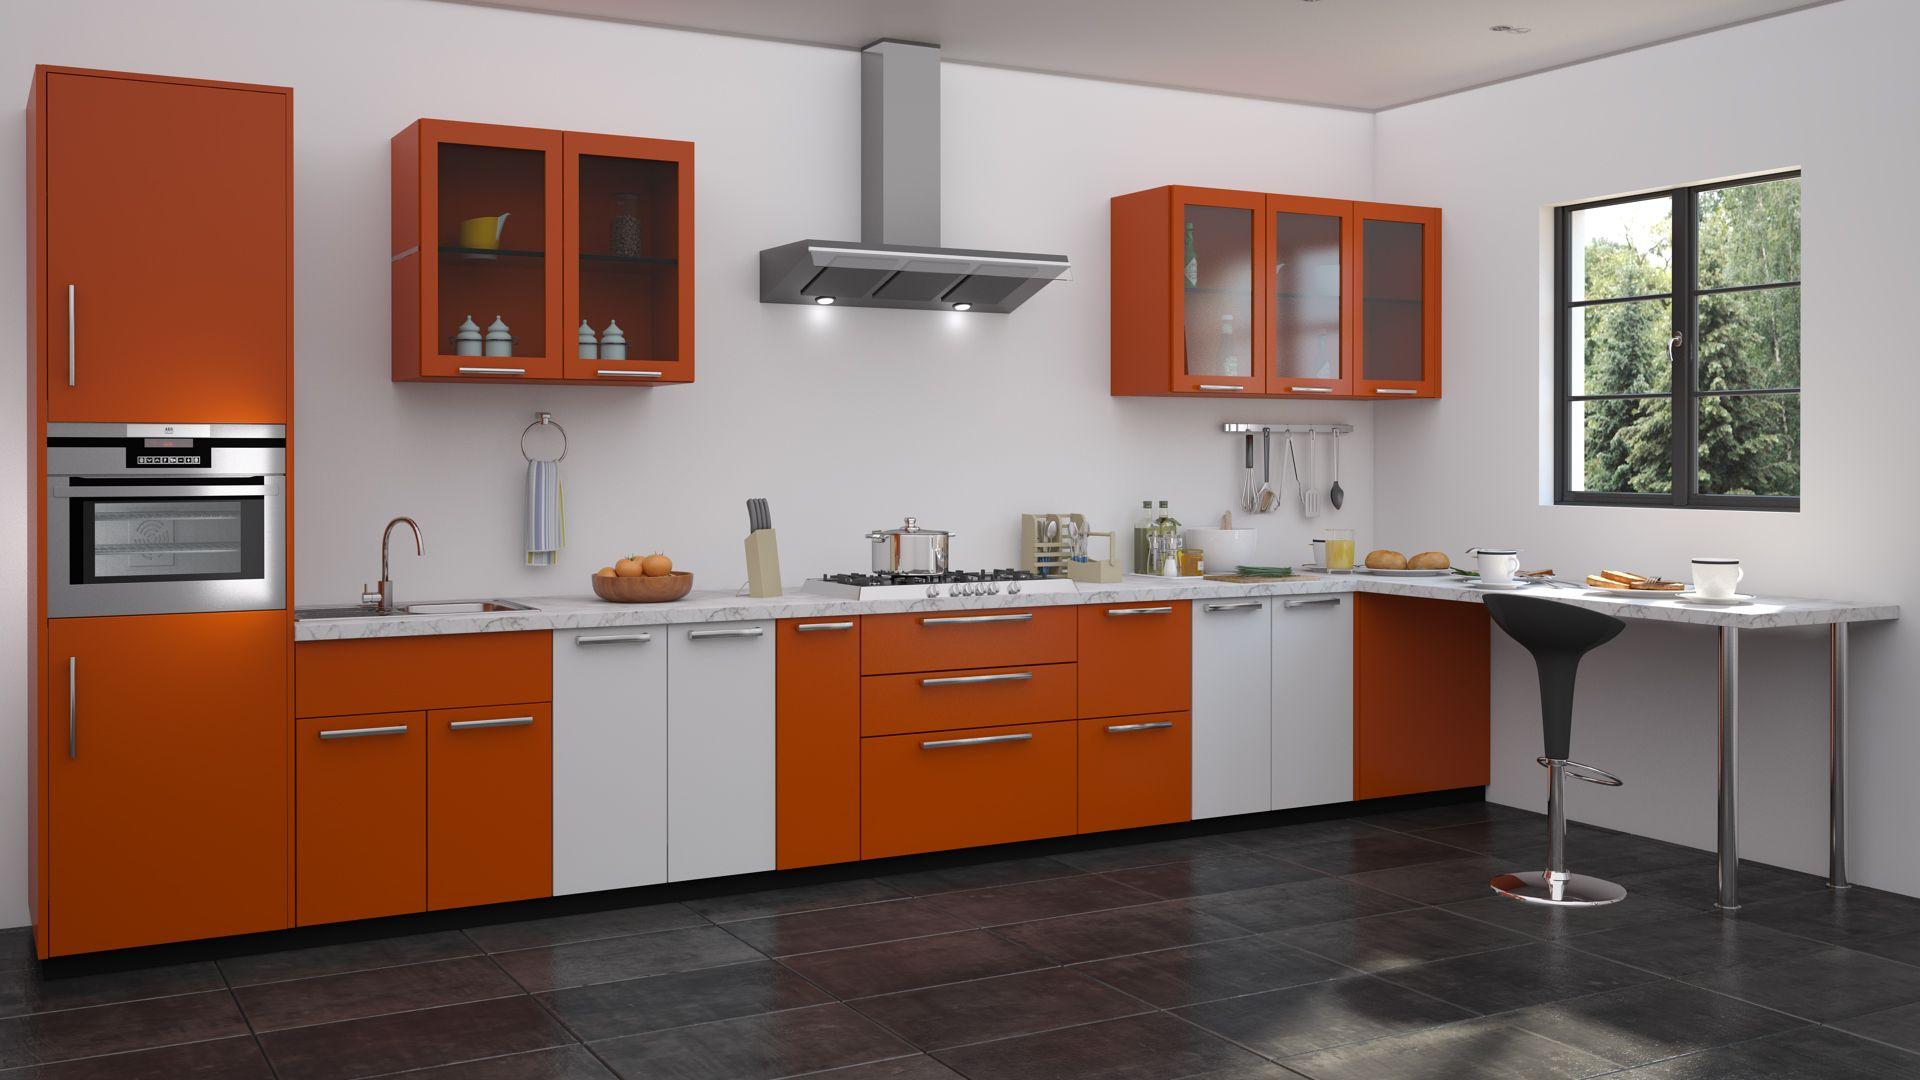 Charming Orange And White Kitchen Ideas Part - 9: Orange Modular Kitchen Design